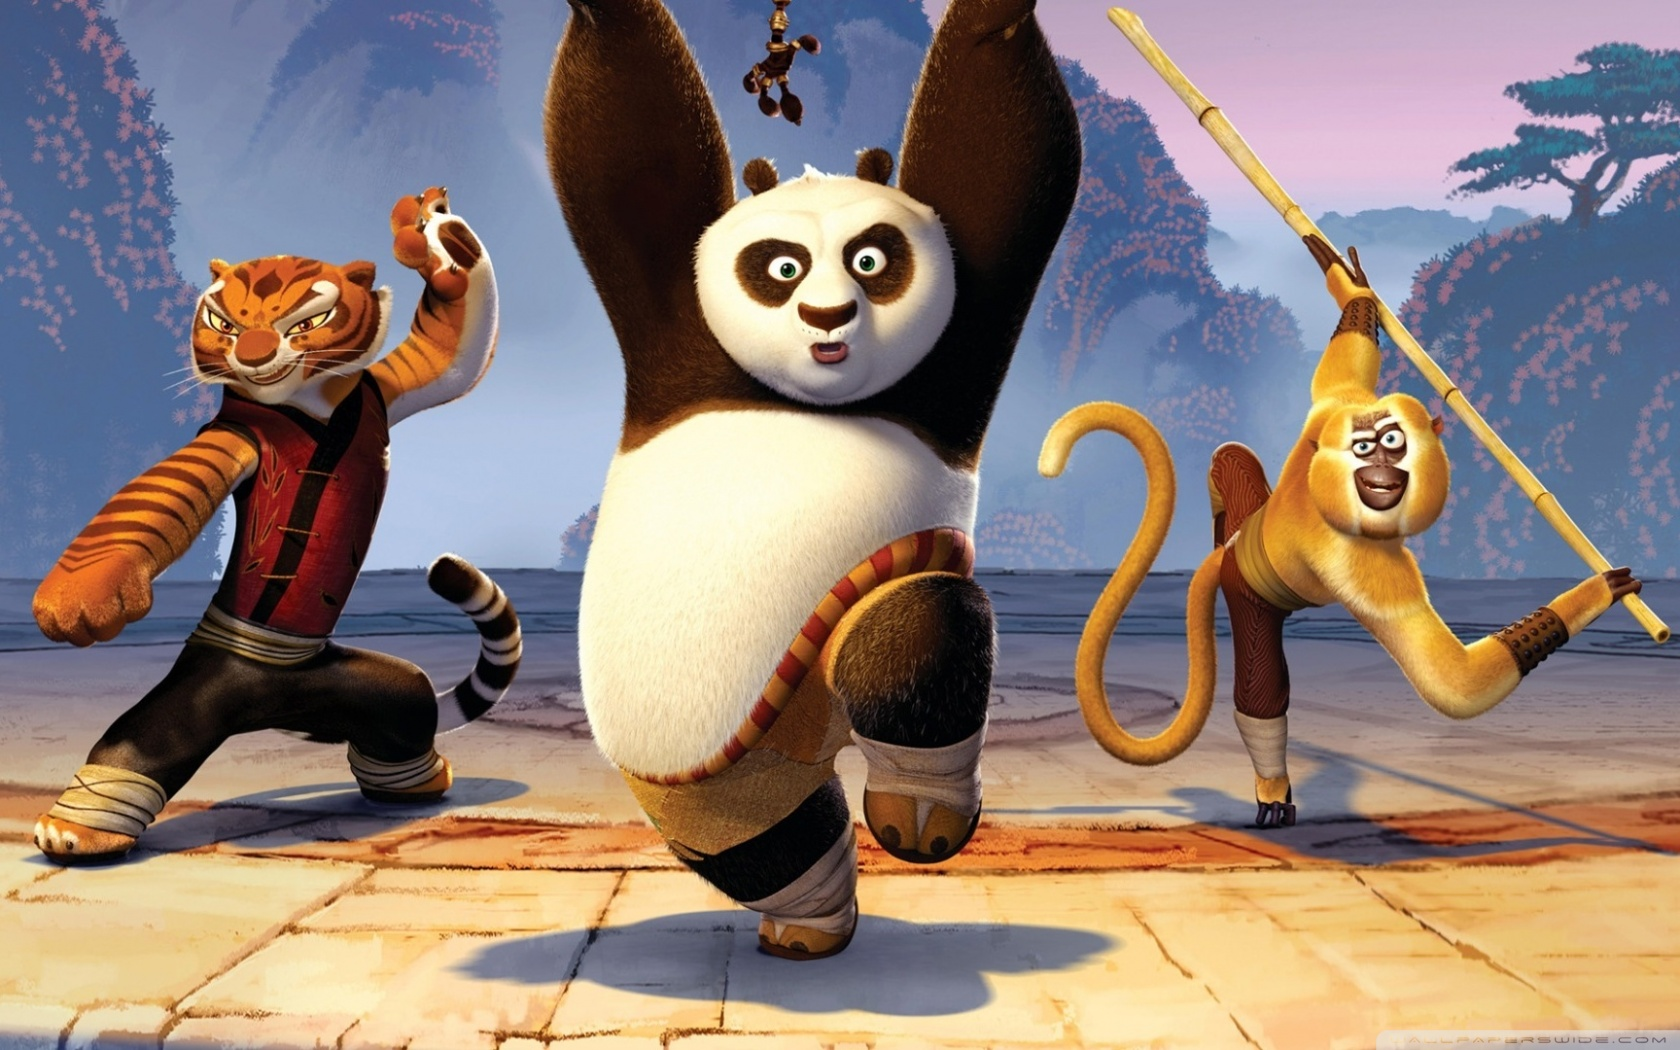 kung_fu_panda_2_movie-wallpaper-1680x1050